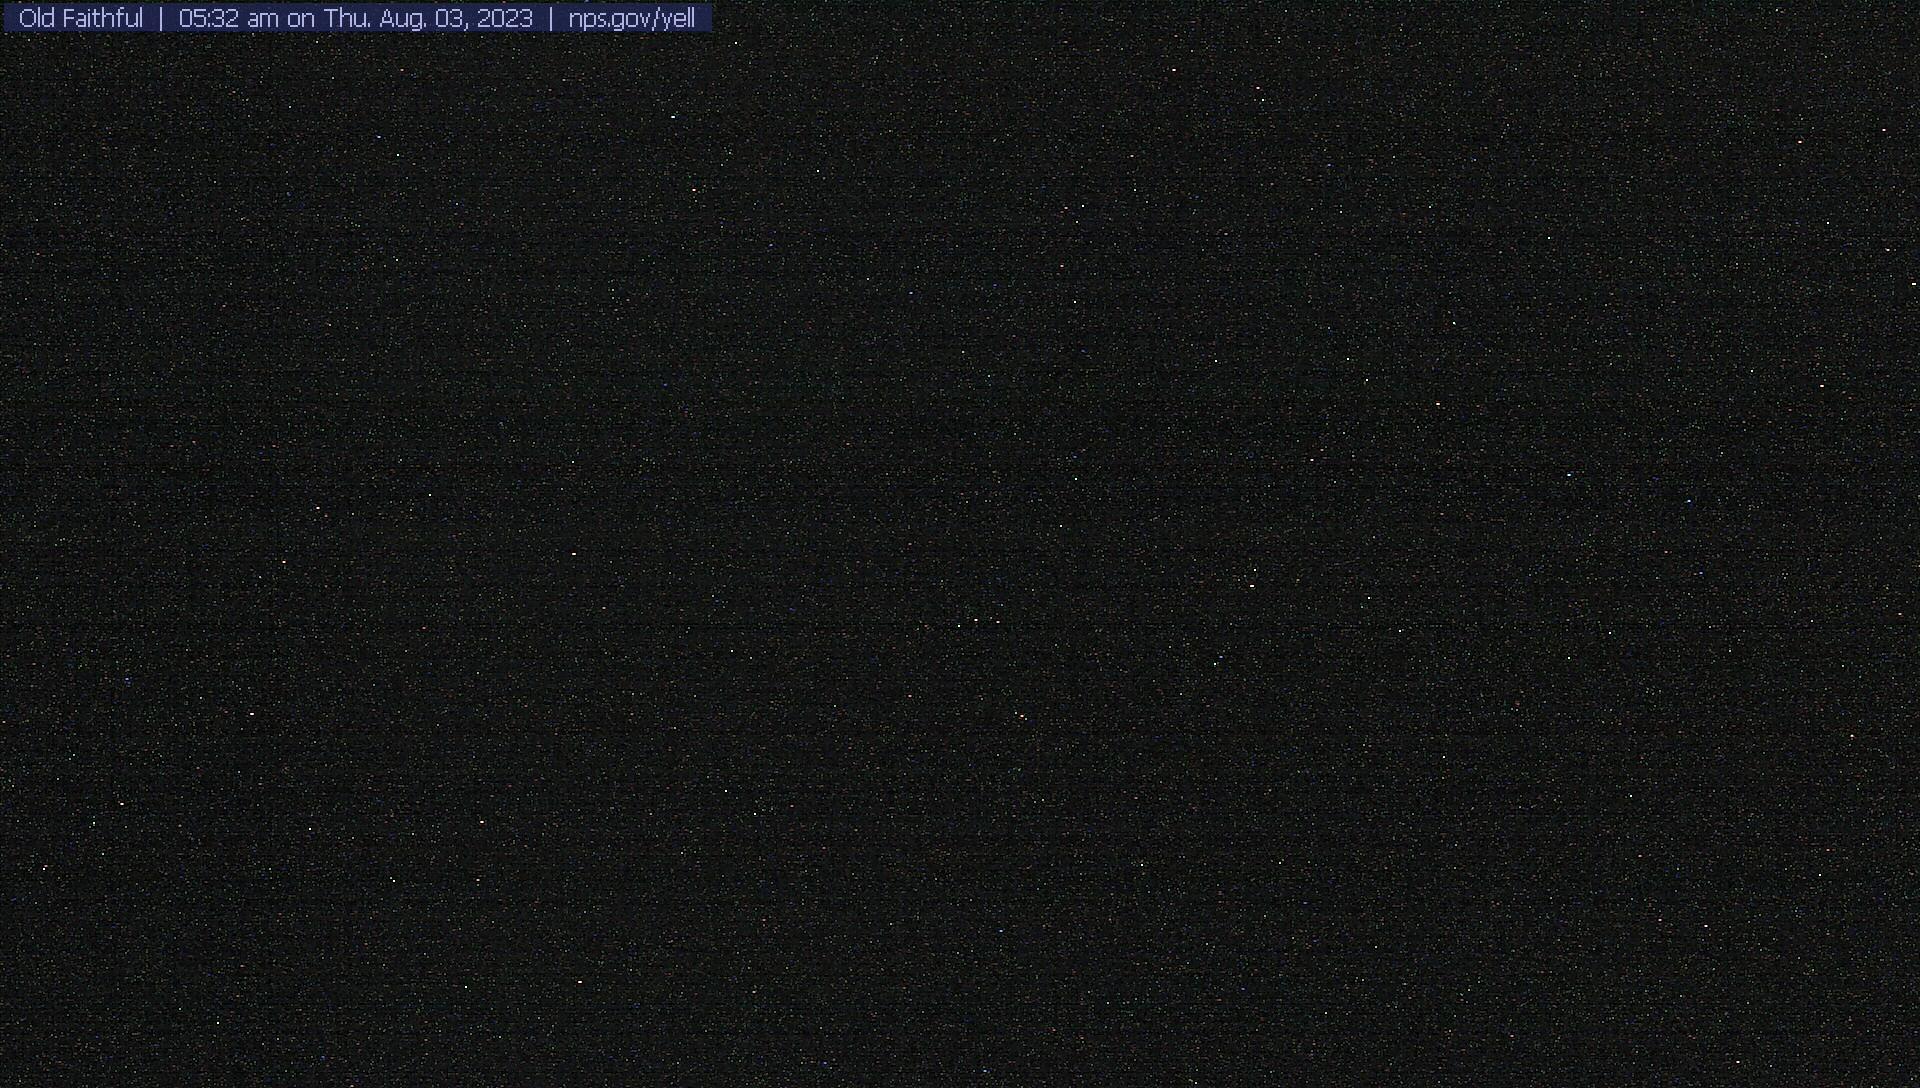 Teton Village Web Cam; Jackson Town Square Web Cam; Old Faithful Geyser Web ...